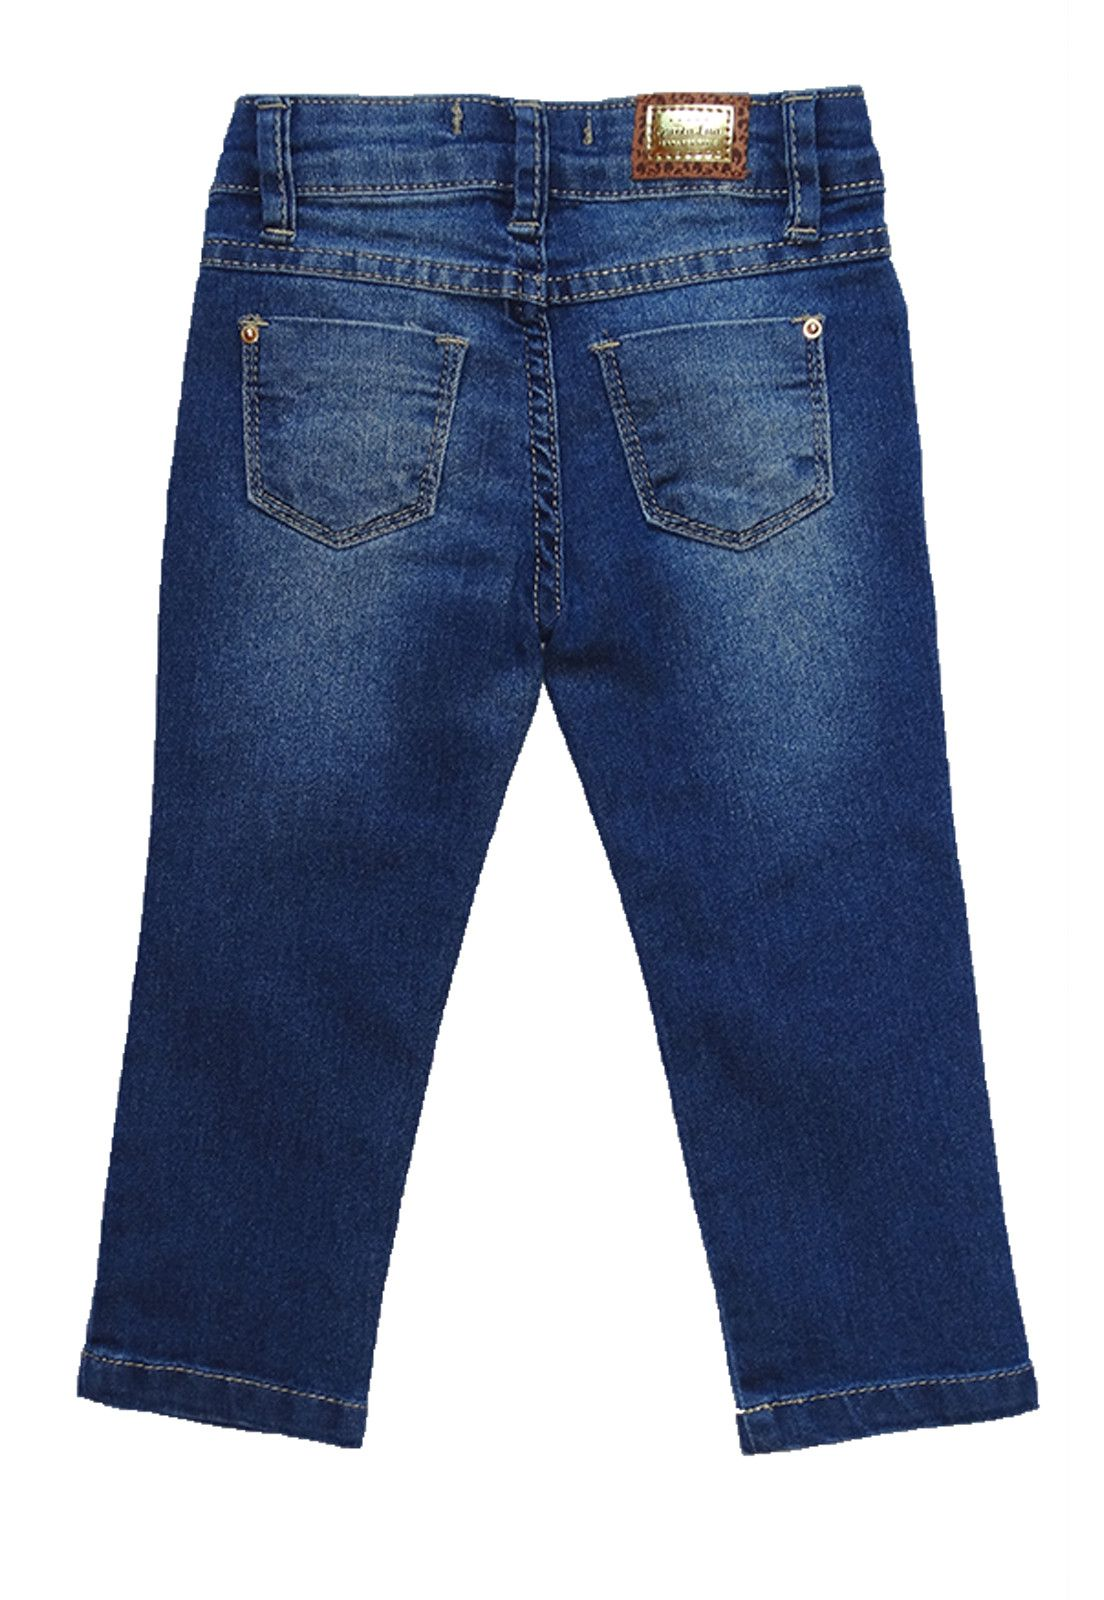 Calça Jeans Infantil Manabana Menina Oferta  - Manabana